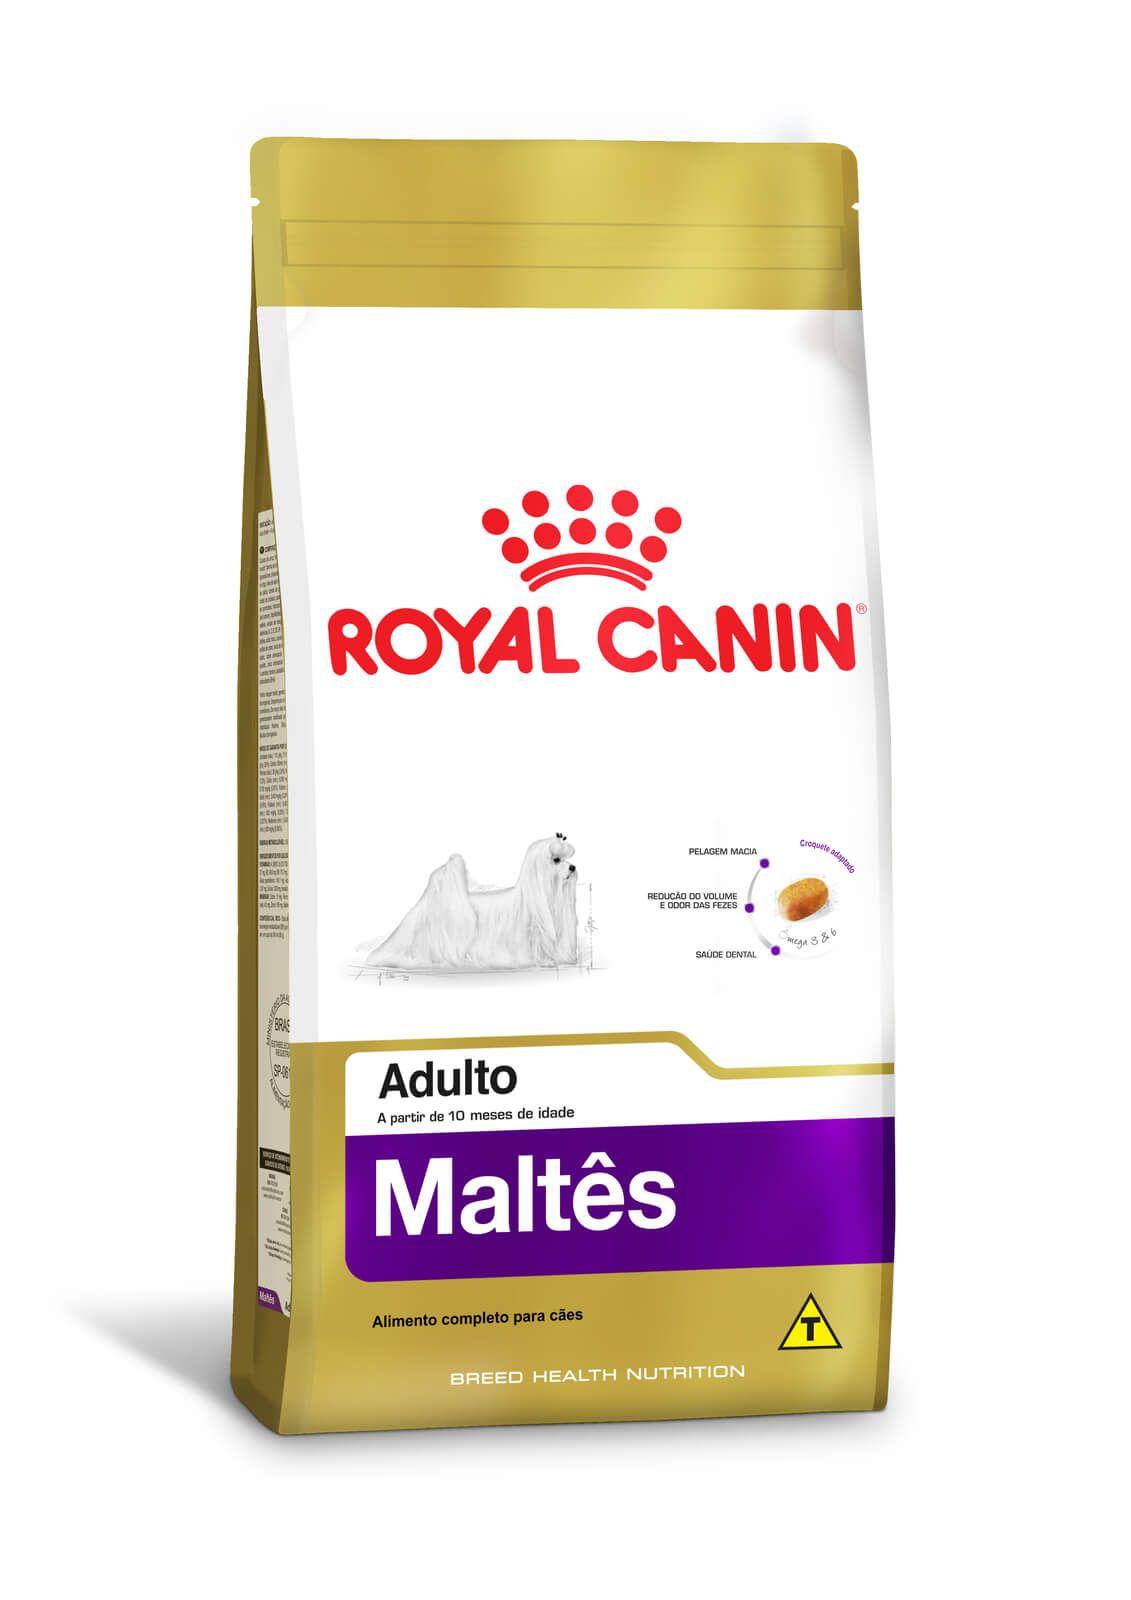 Ração Royal Canin Maltês Adult 2,5 kg